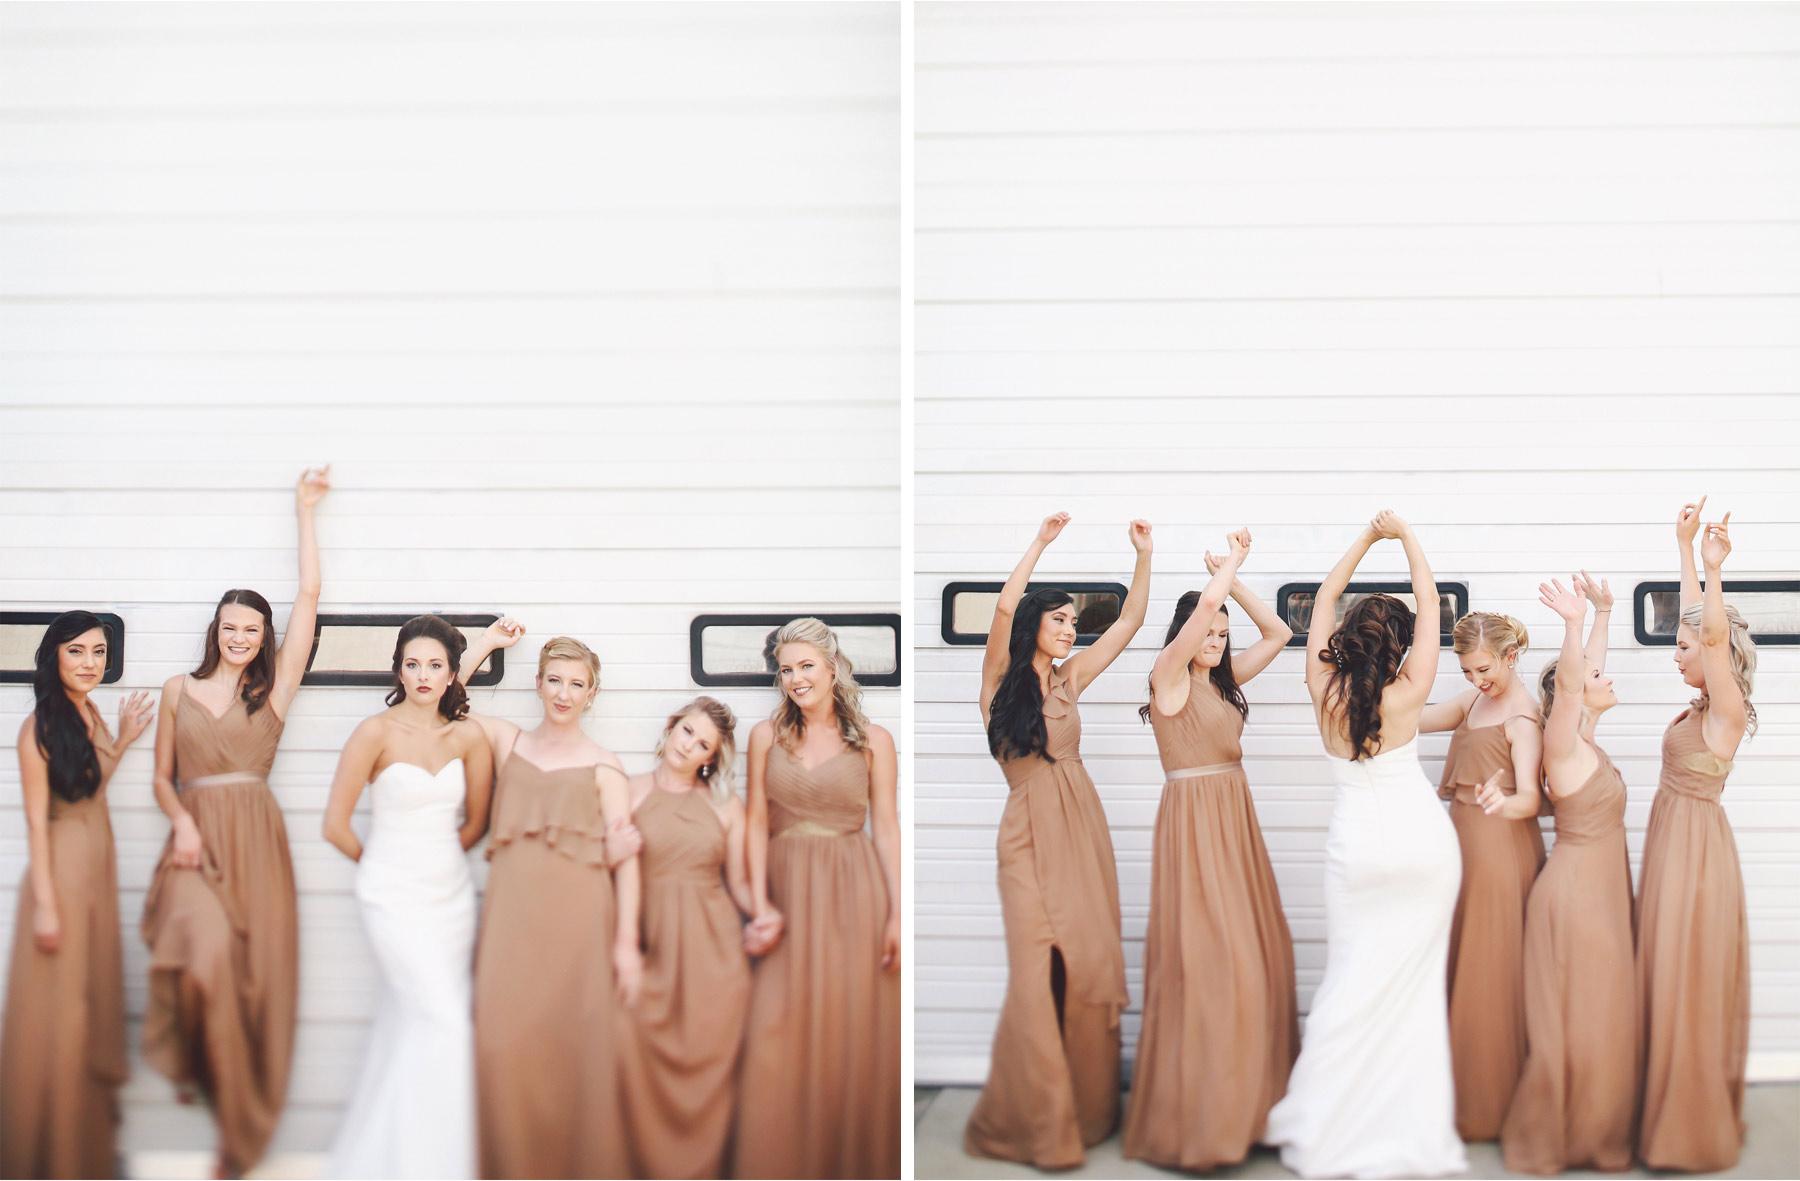 11-Kansas-City-Missouri-Destination-Wedding-Photography-by-Vick-Photography-Bridesmaids-Downtown-Carly-and-Kenny.jpg